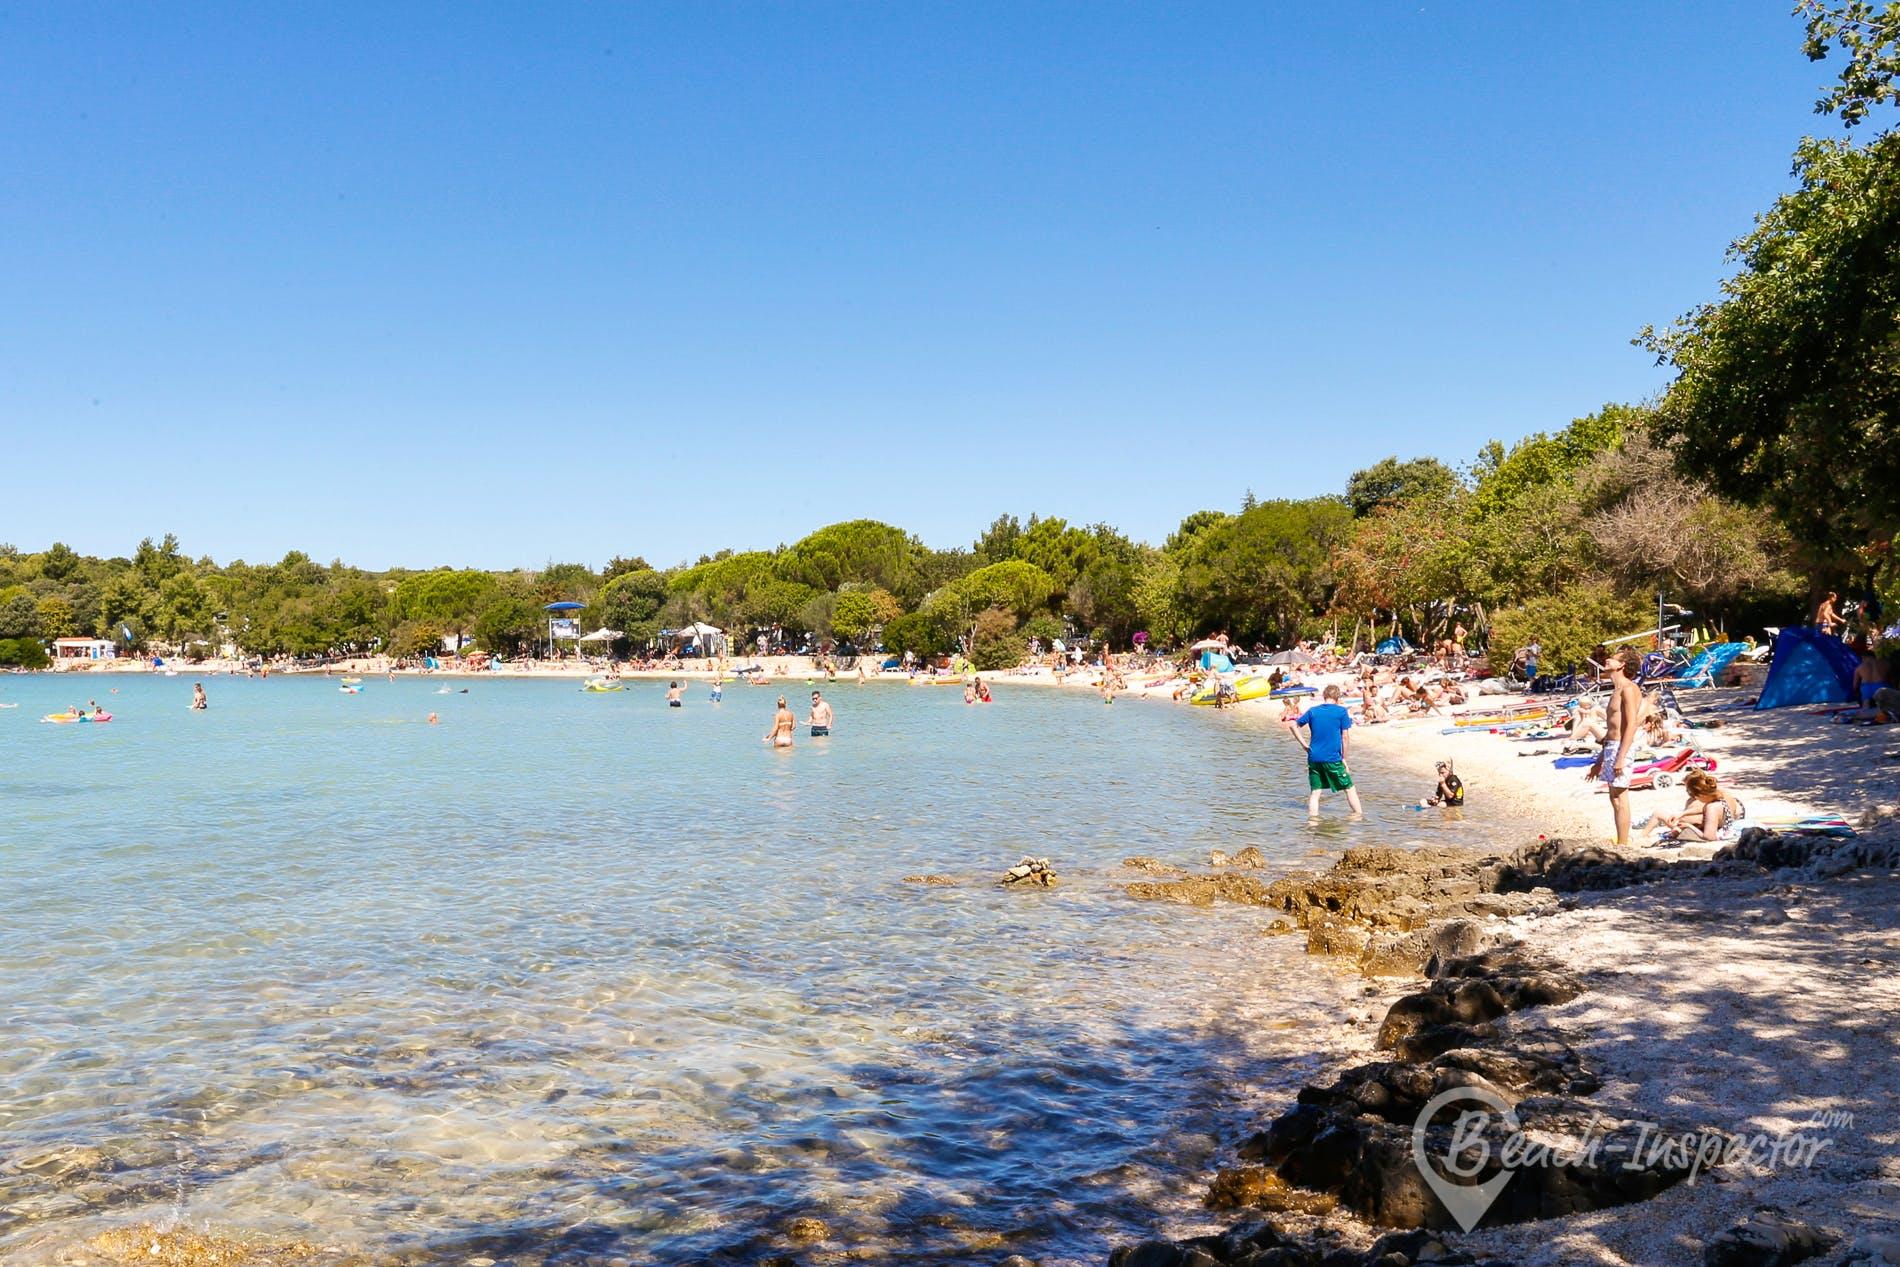 Beach Vestar Beach, Istria, Croatia